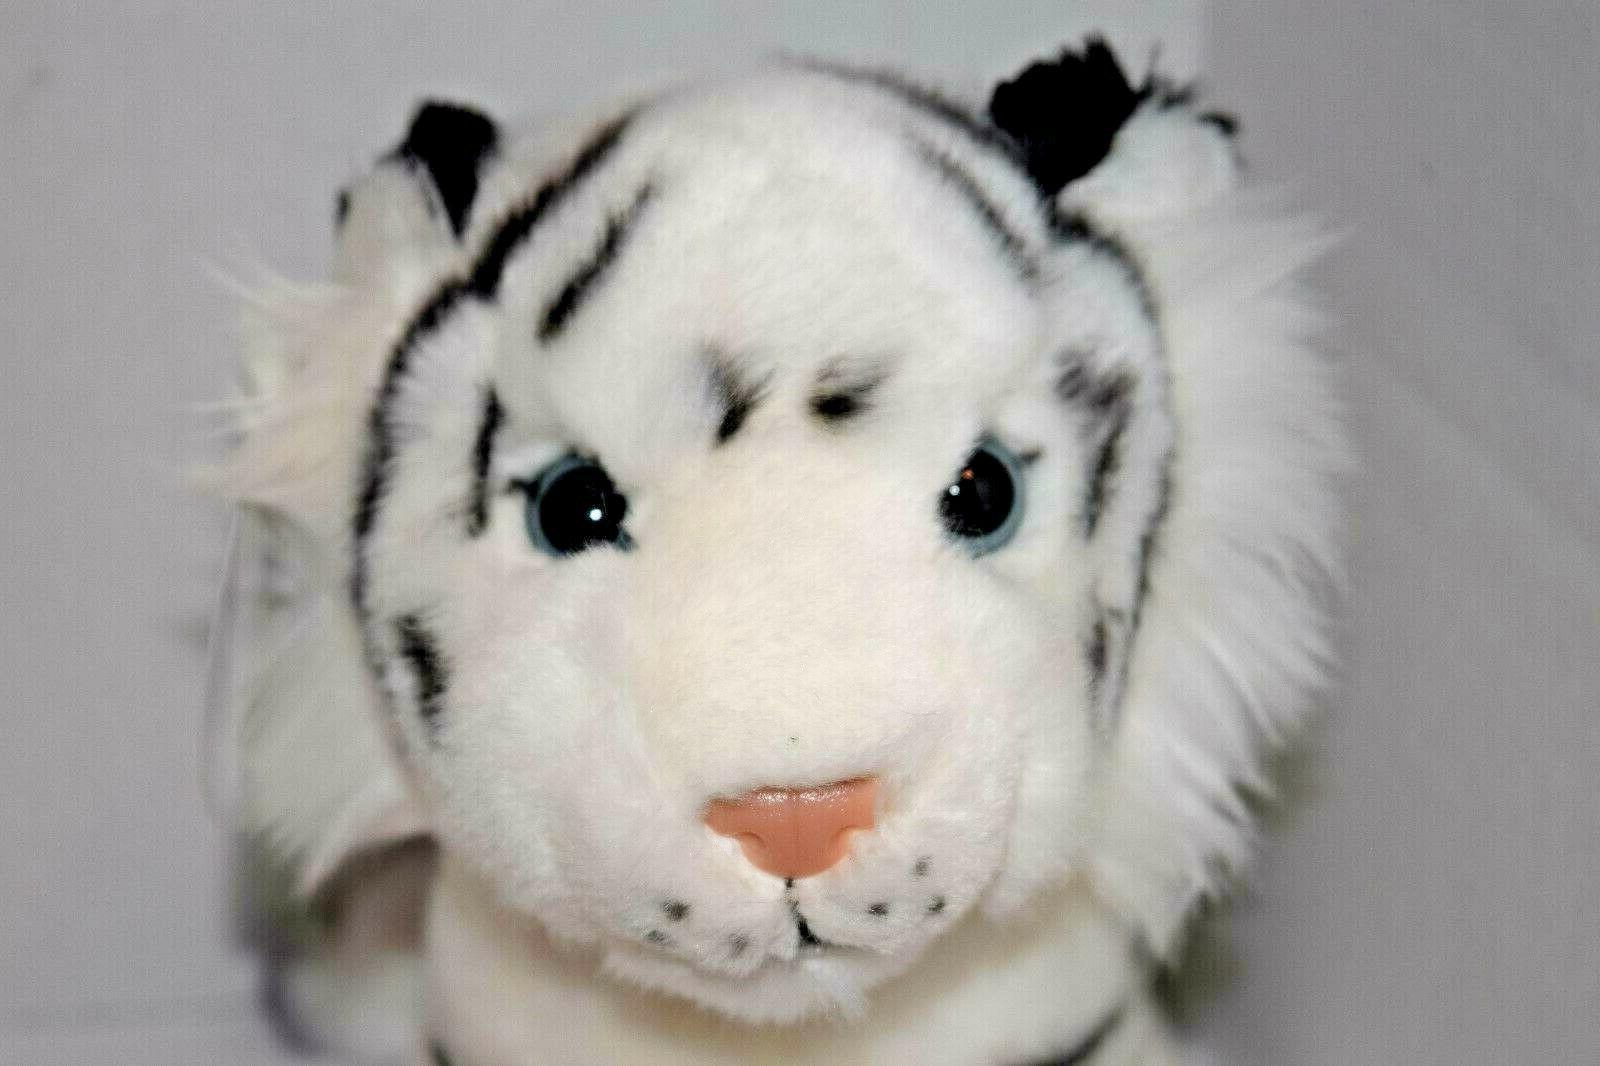 "7"" White Tiger Stuffed Animal Soft Jungle"